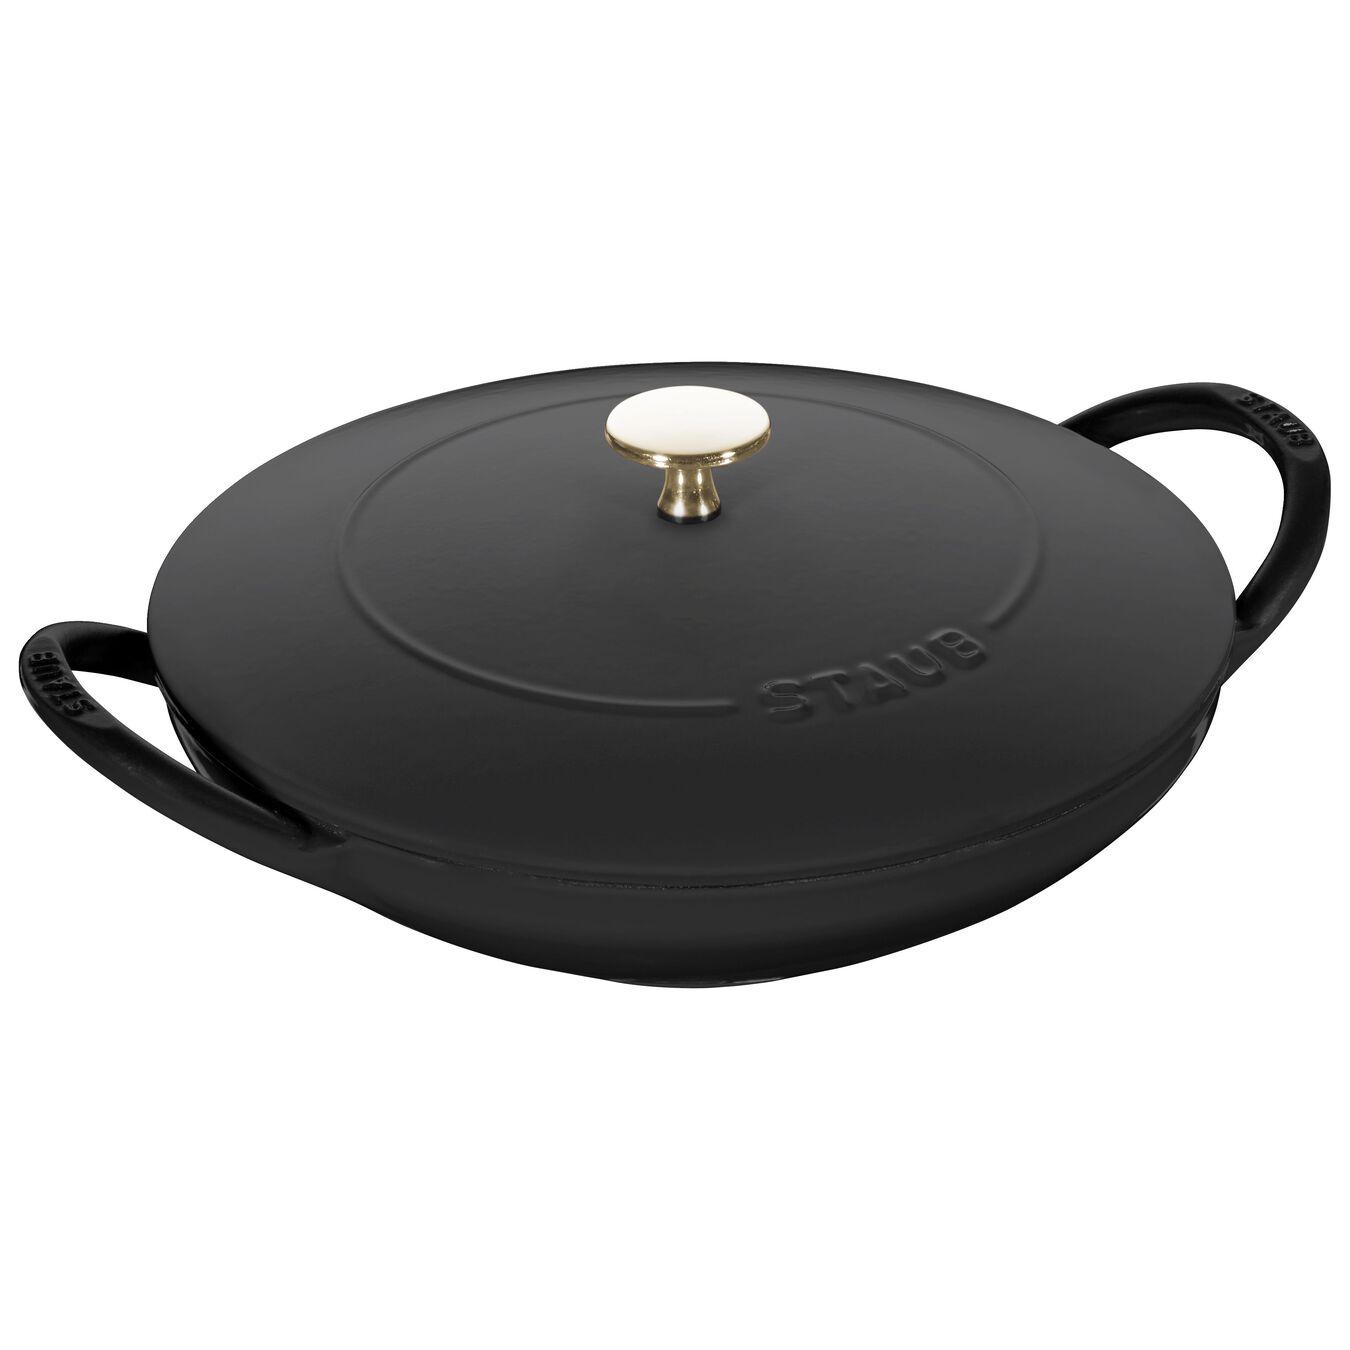 24 cm / 9.5 inch Cast iron Wok, Black,,large 1